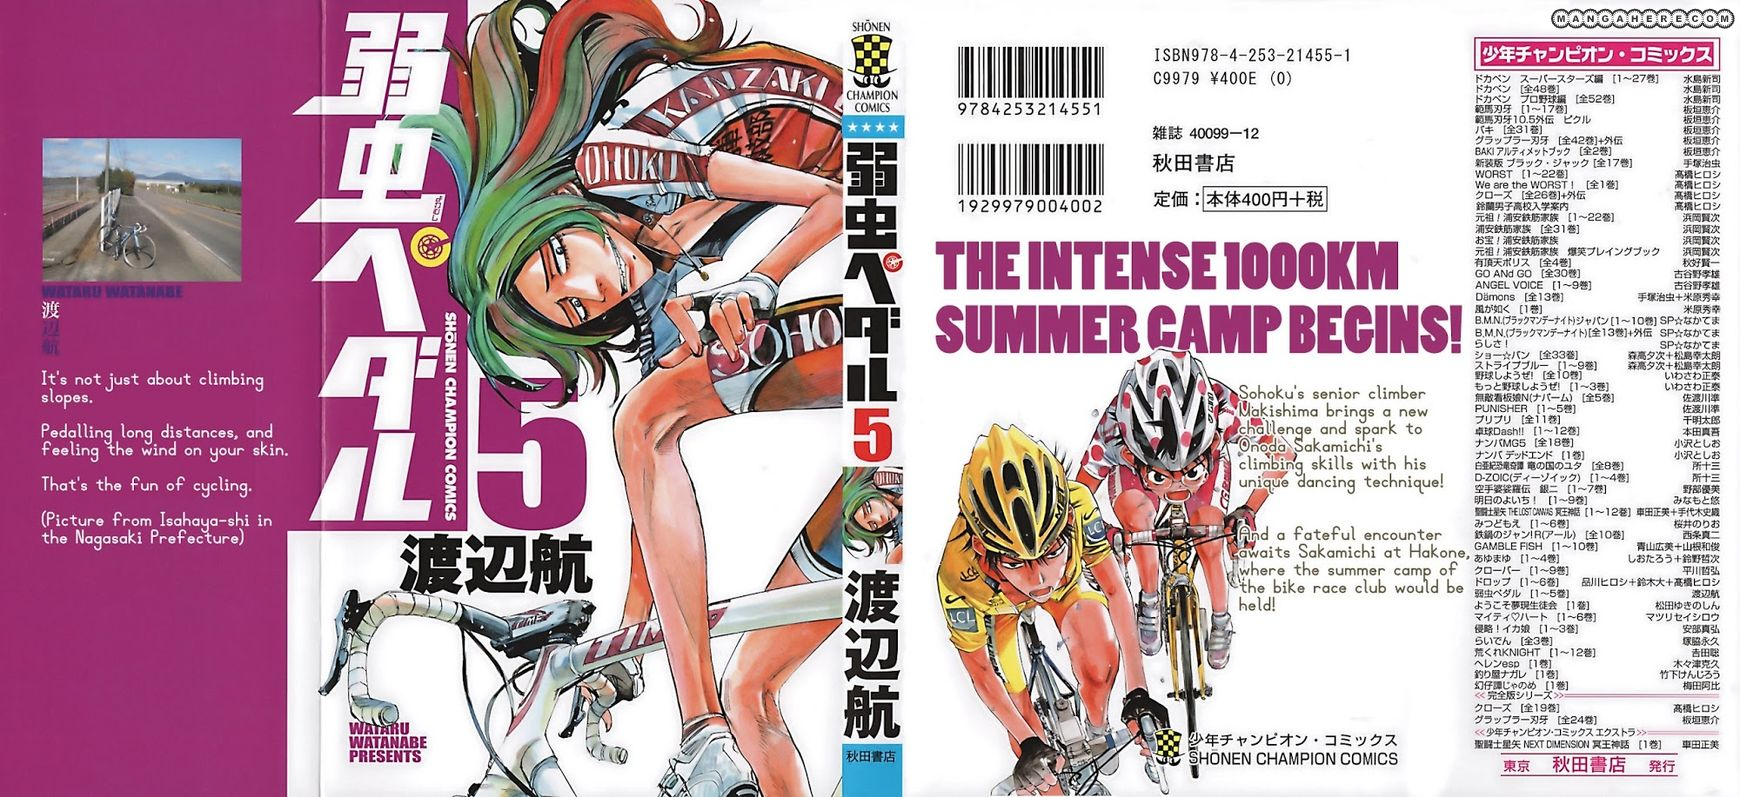 Yowamushi Pedal 35 Page 1